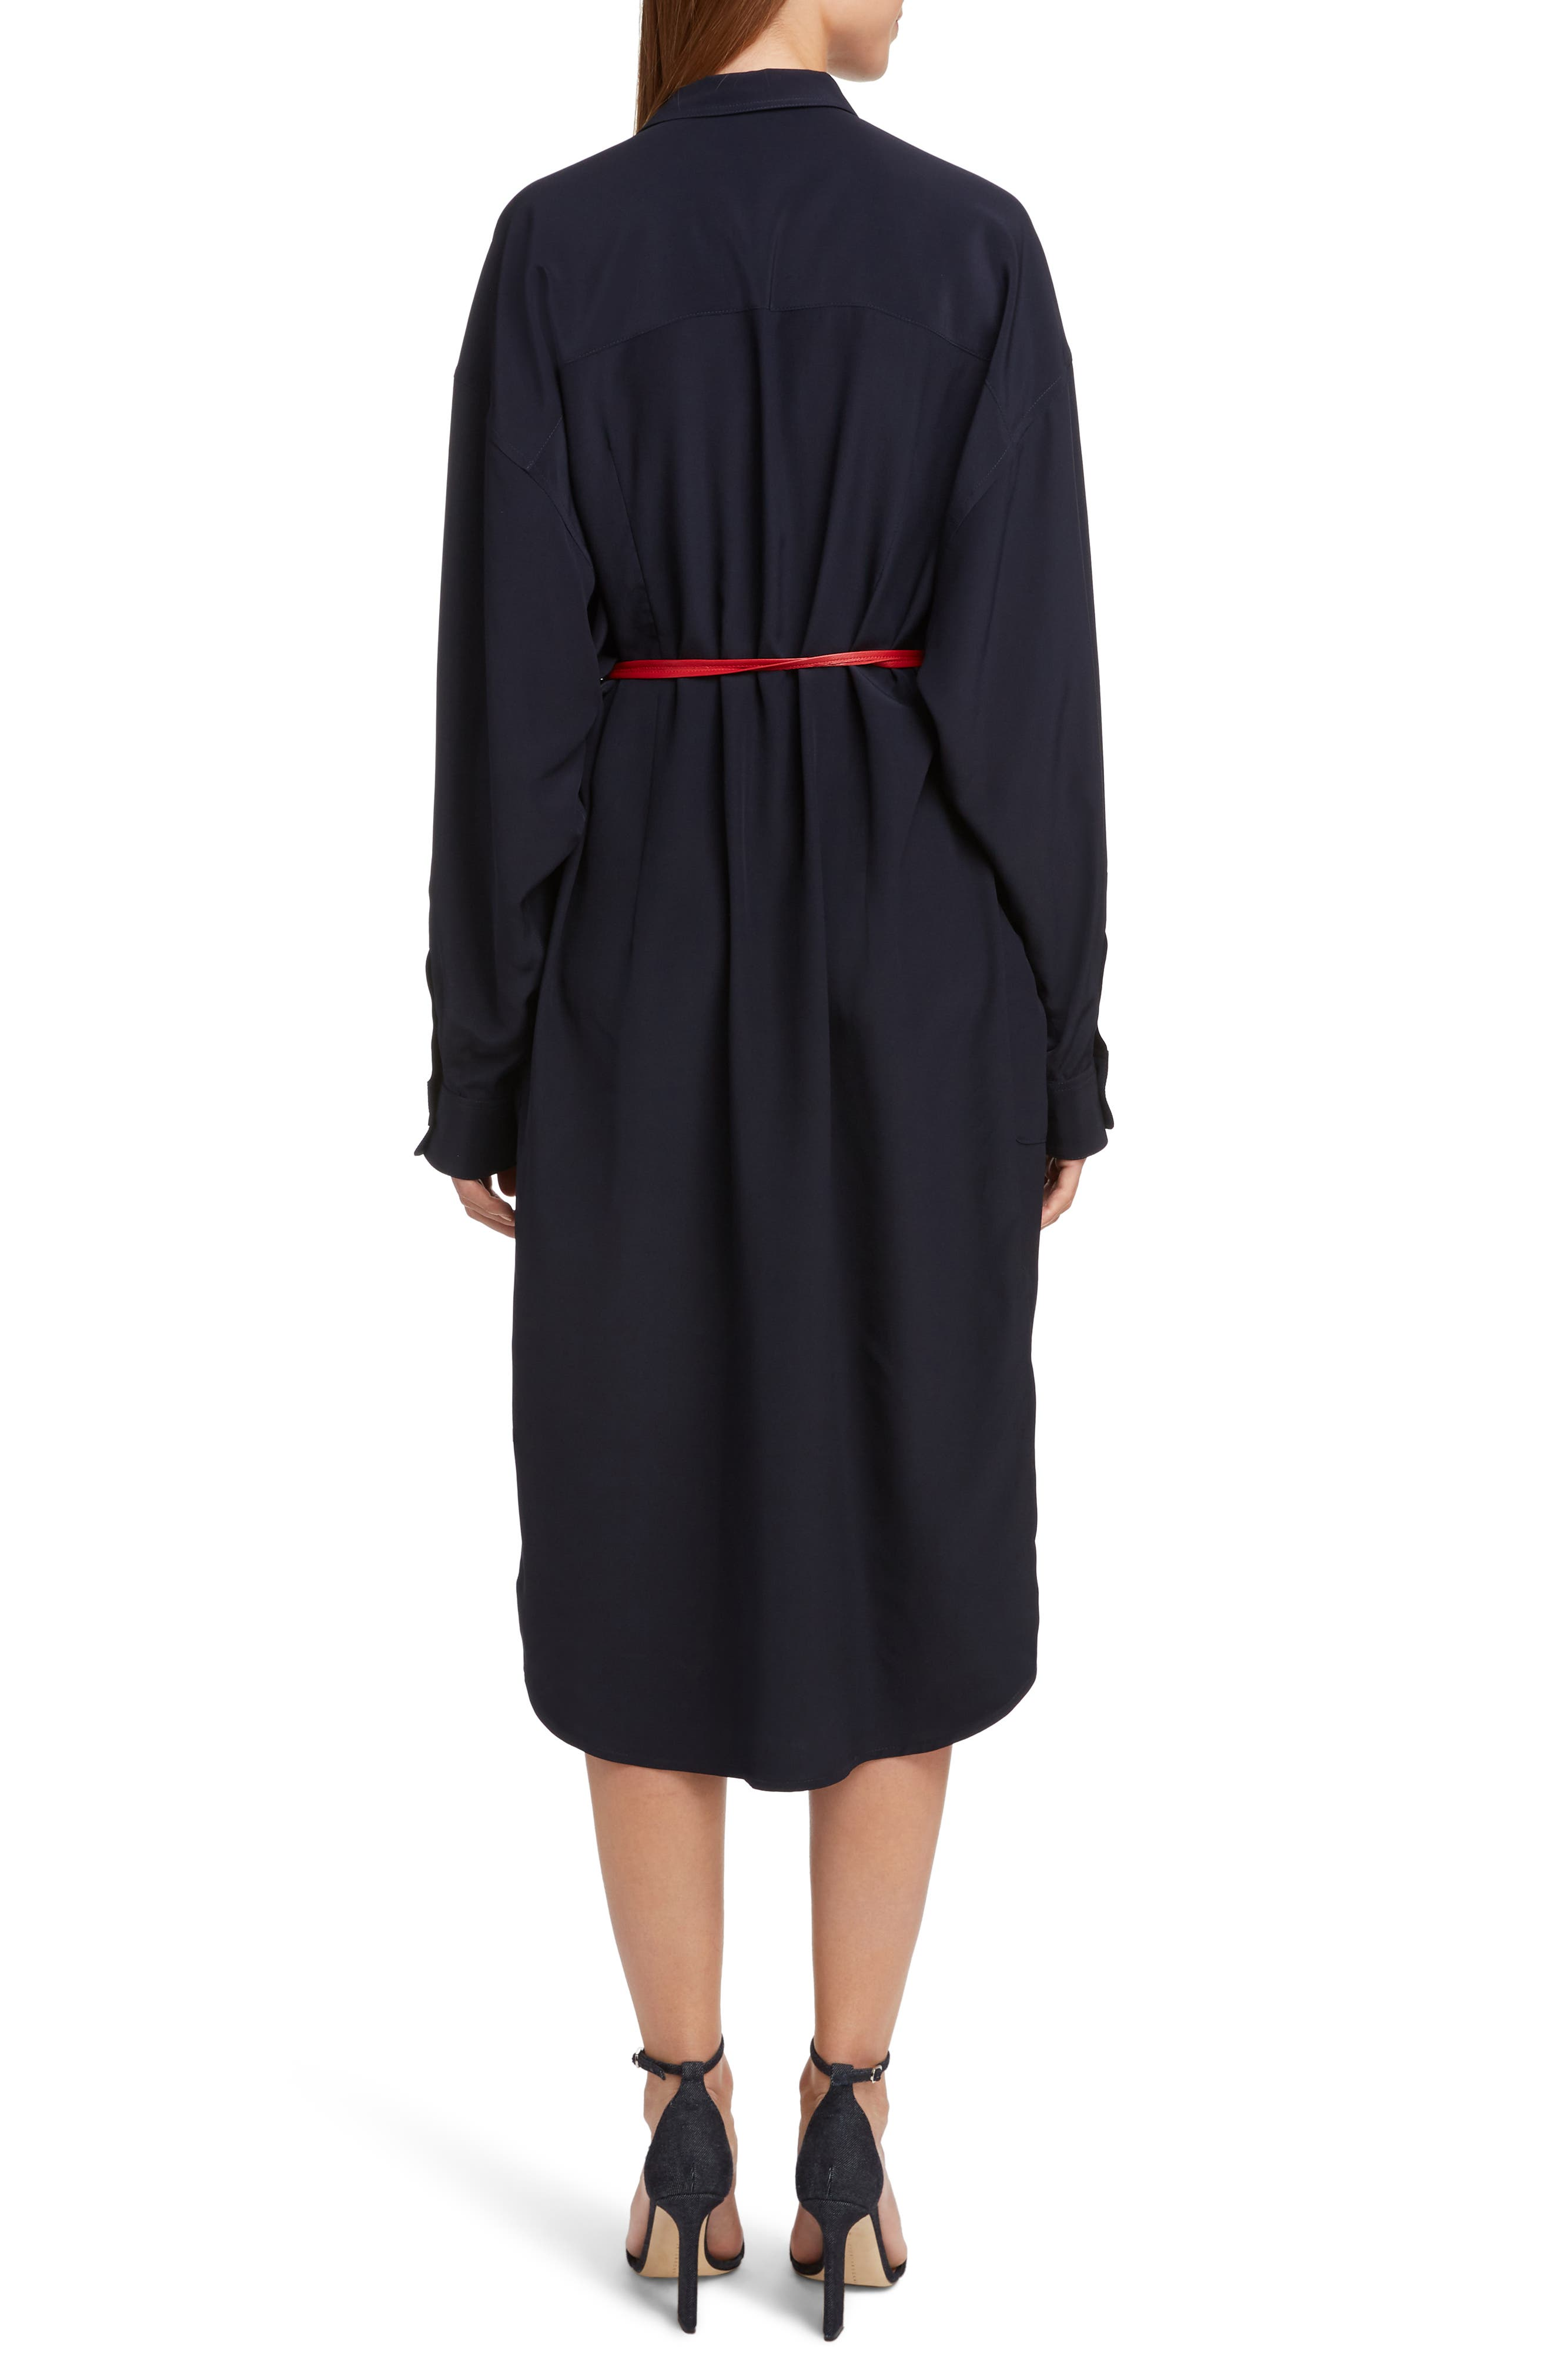 VICTORIA BECKHAM, Belted Silk Shirtdress, Alternate thumbnail 2, color, NAVY/ RED